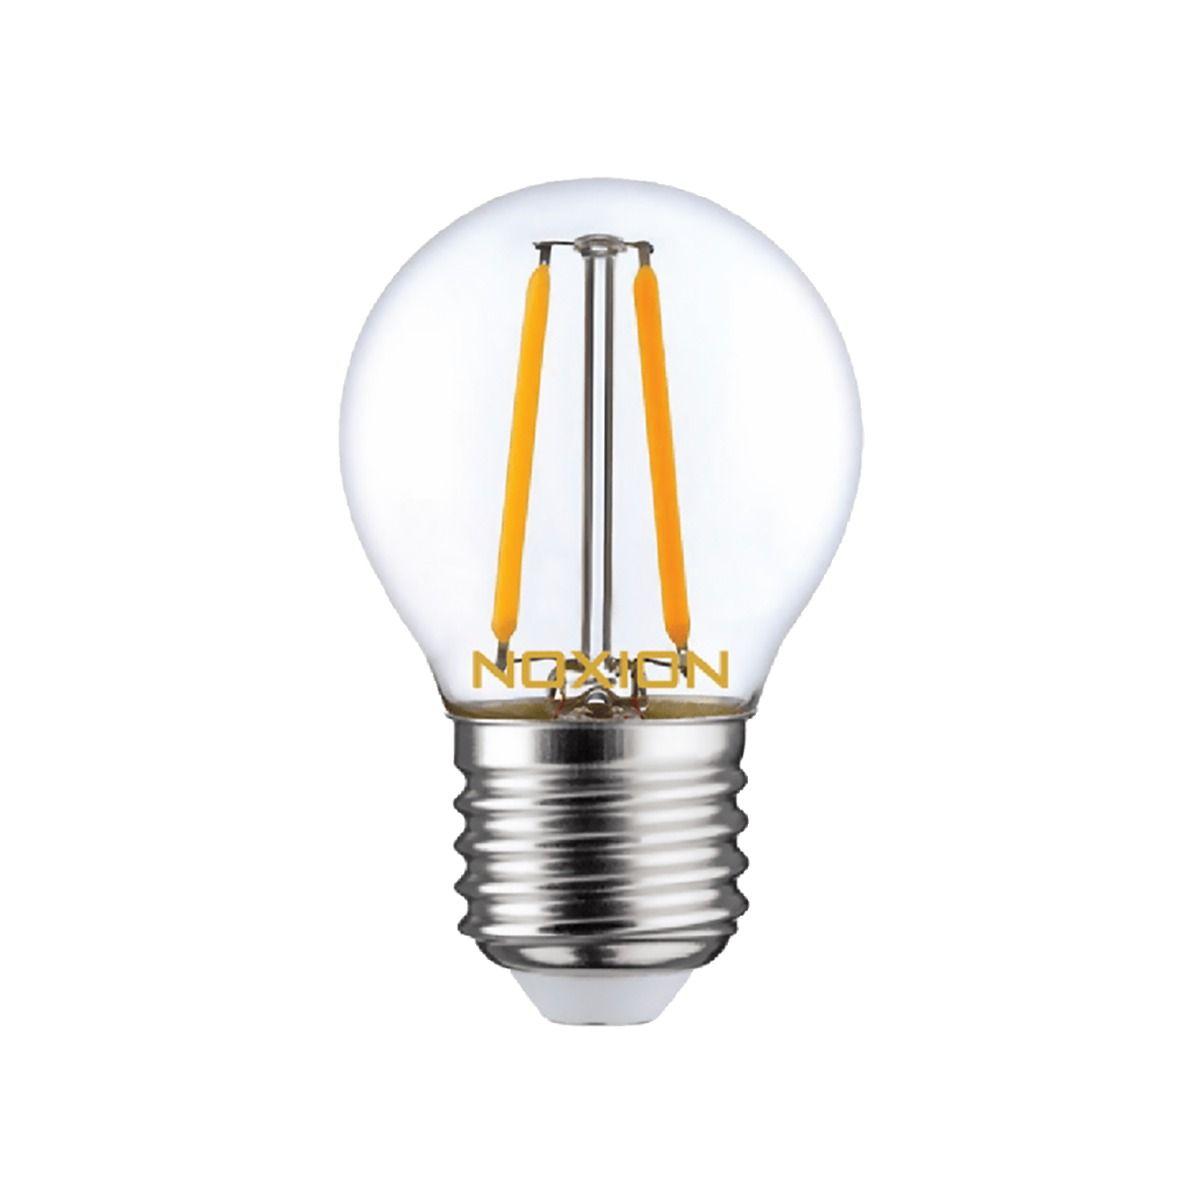 Noxion Lucent LED Lustre E27 2.6W 827 Fadenlampe | Extra Warmweiß - Ersatz für 25W